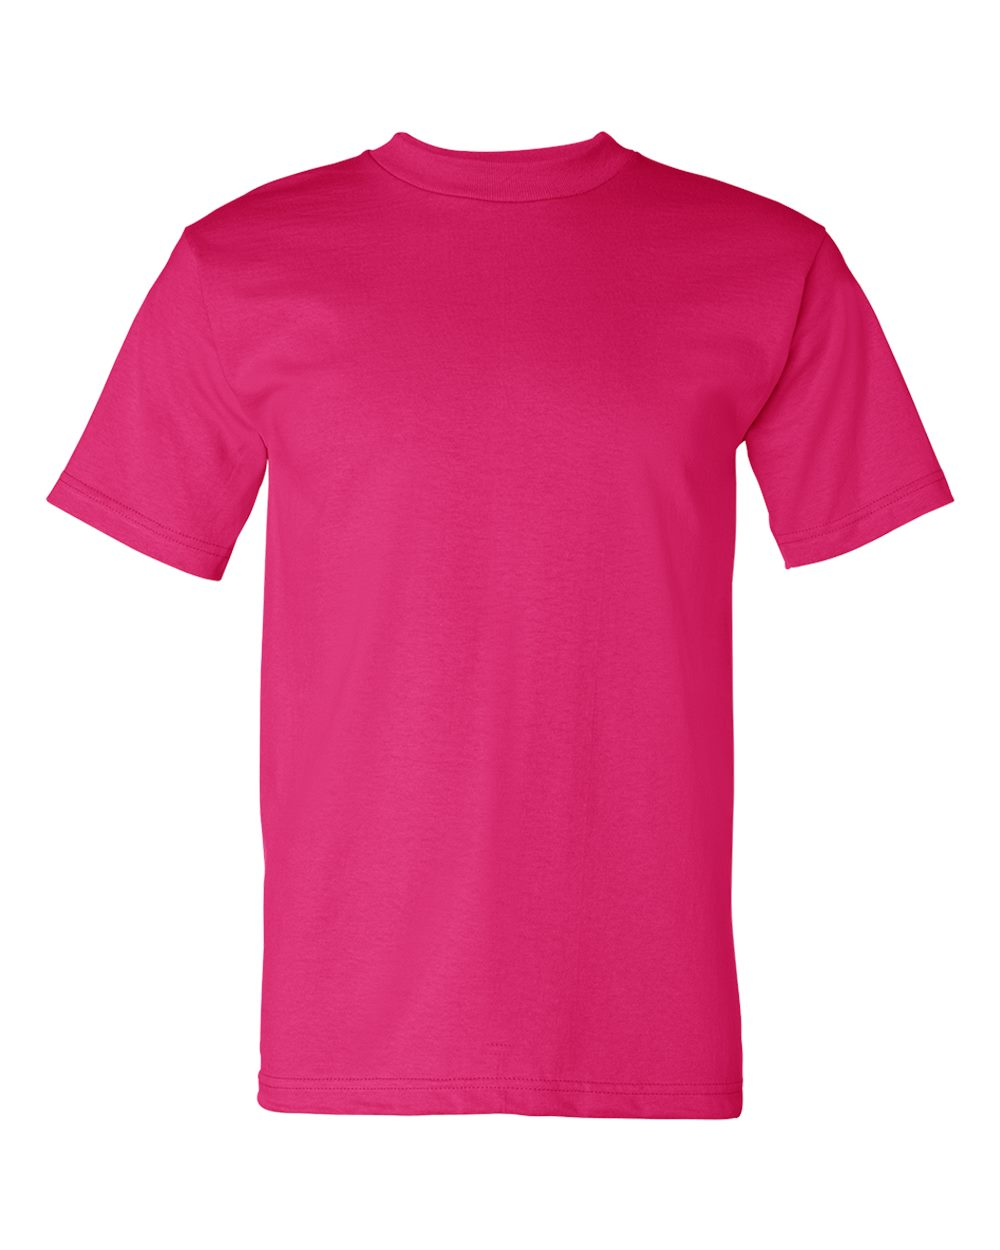 Bayside-Mens-Cotton-Blank-USA-Made-Short-Sleeve-T-Shirt-5100-up-to-5XL thumbnail 12